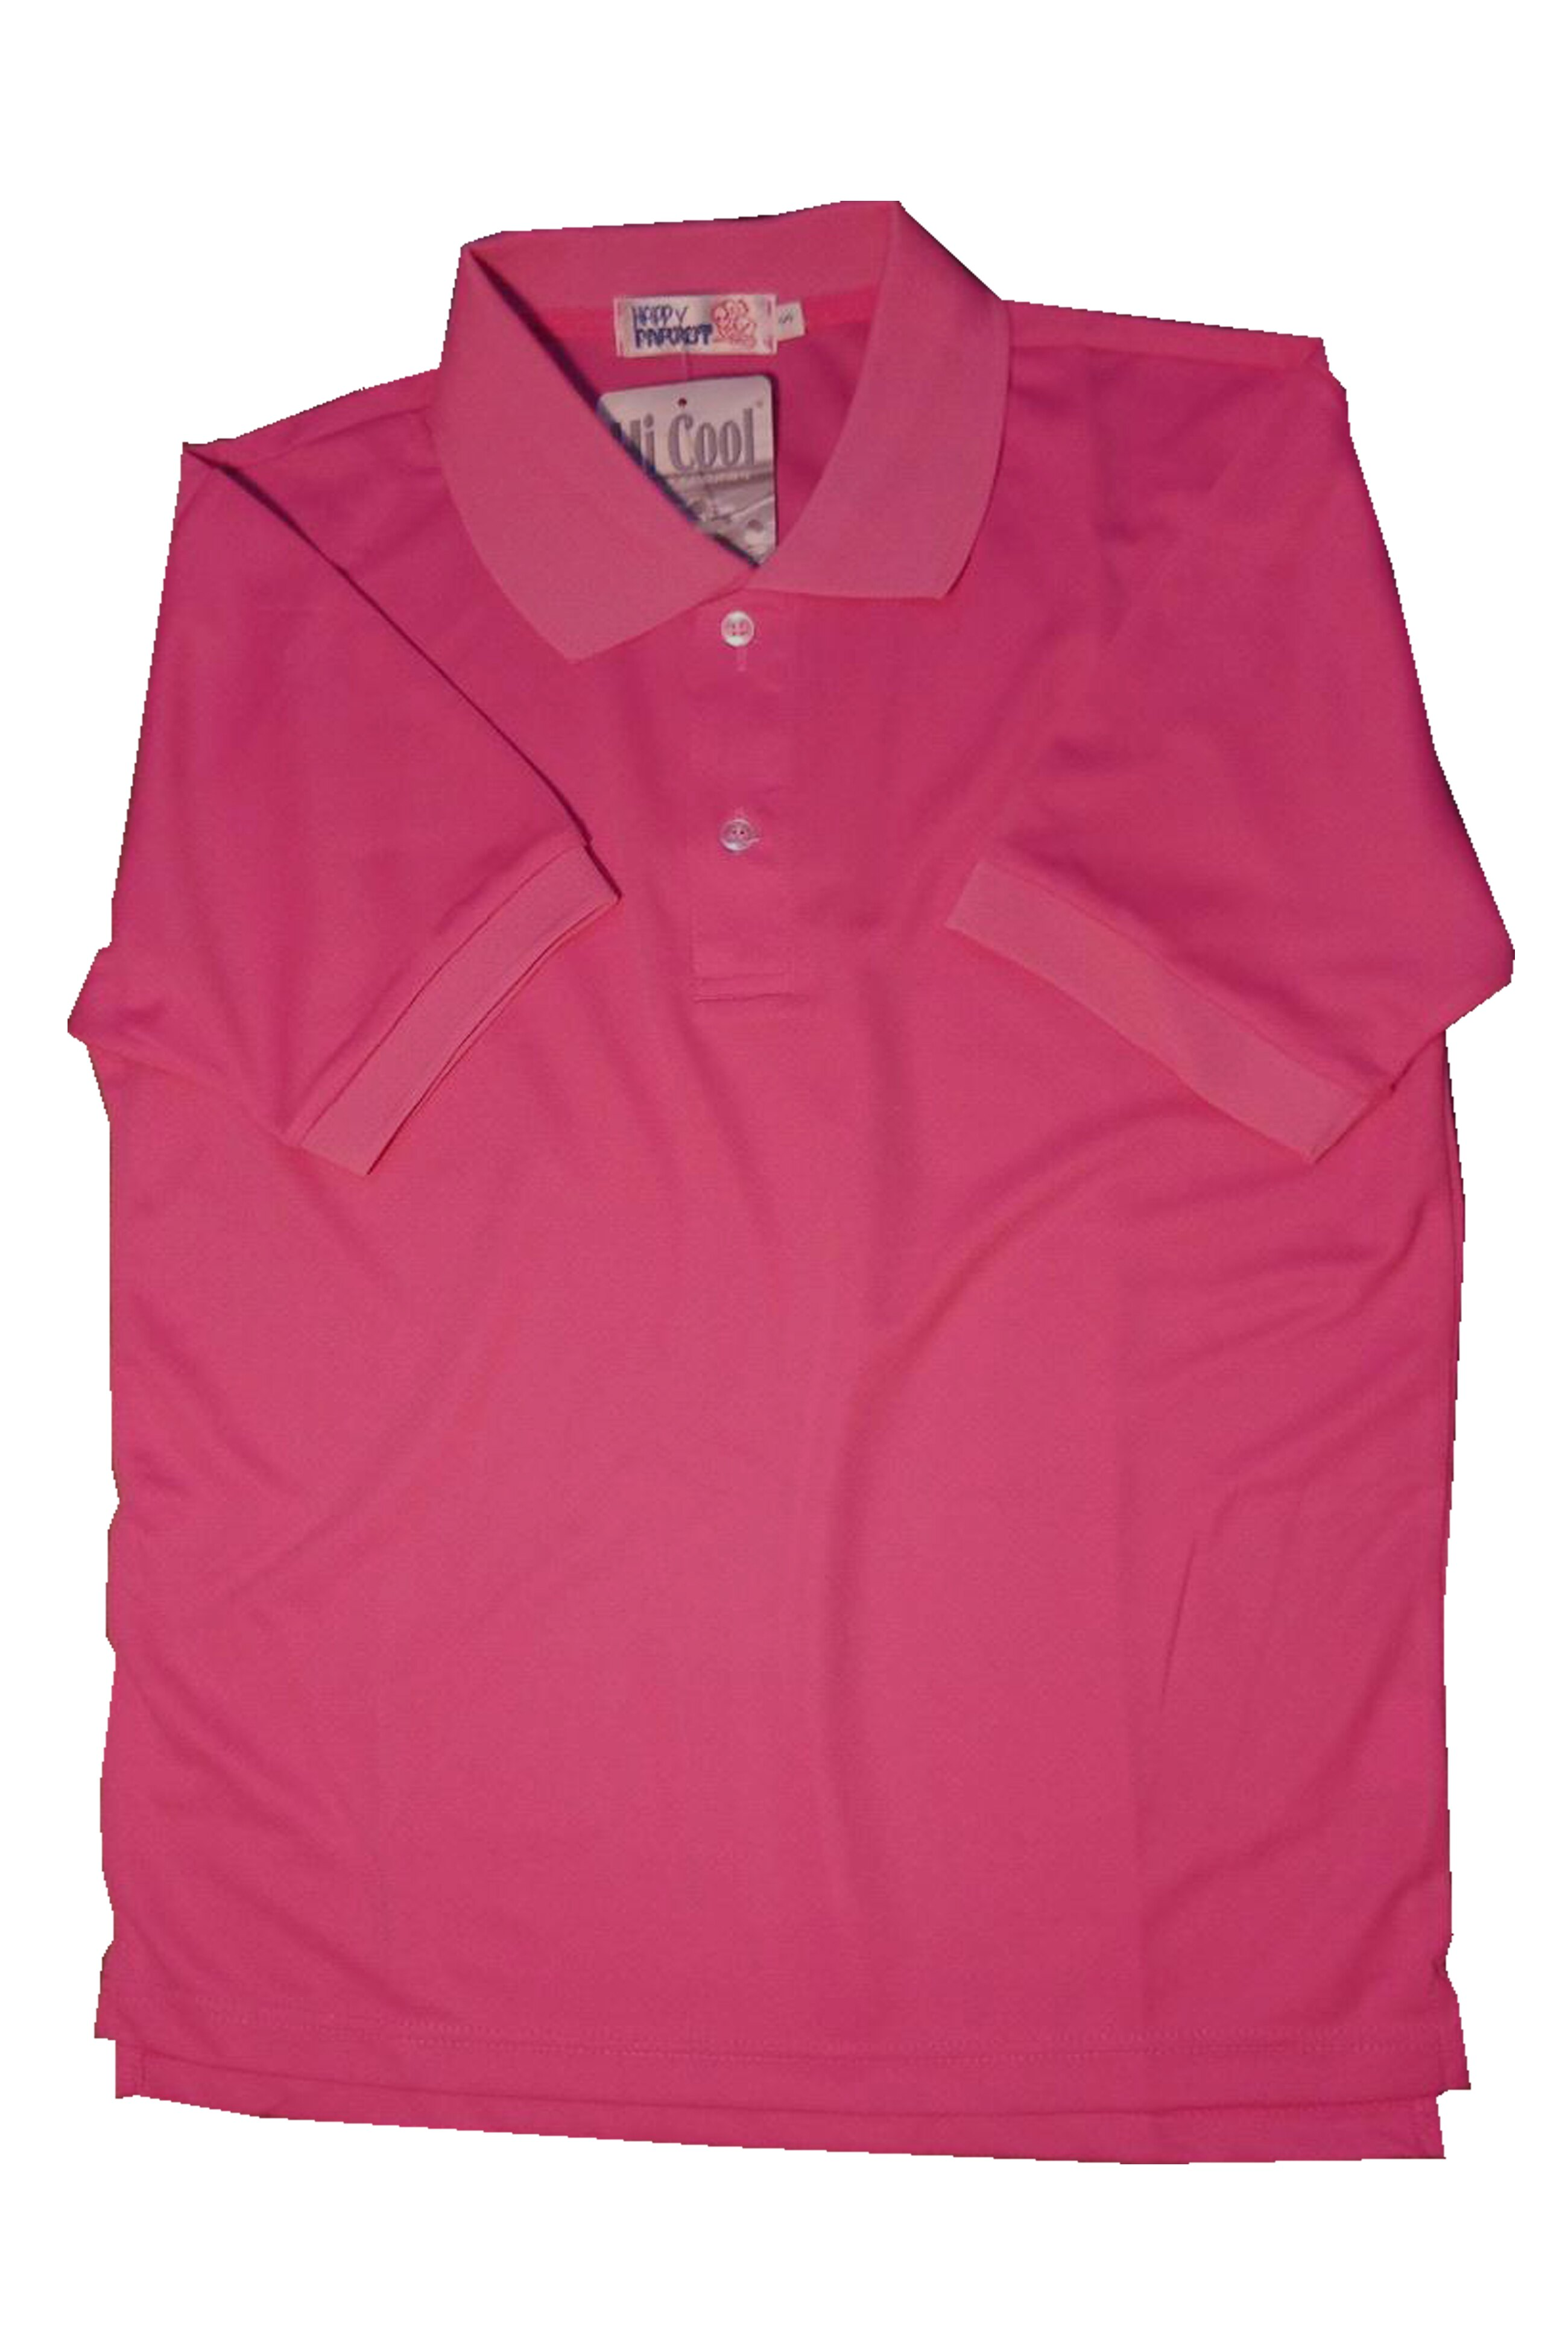 HI-Cool Polo shirts 台灣製作中空紗吸濕排汗Polo衫-玫紅色,團體服可以專業訂製